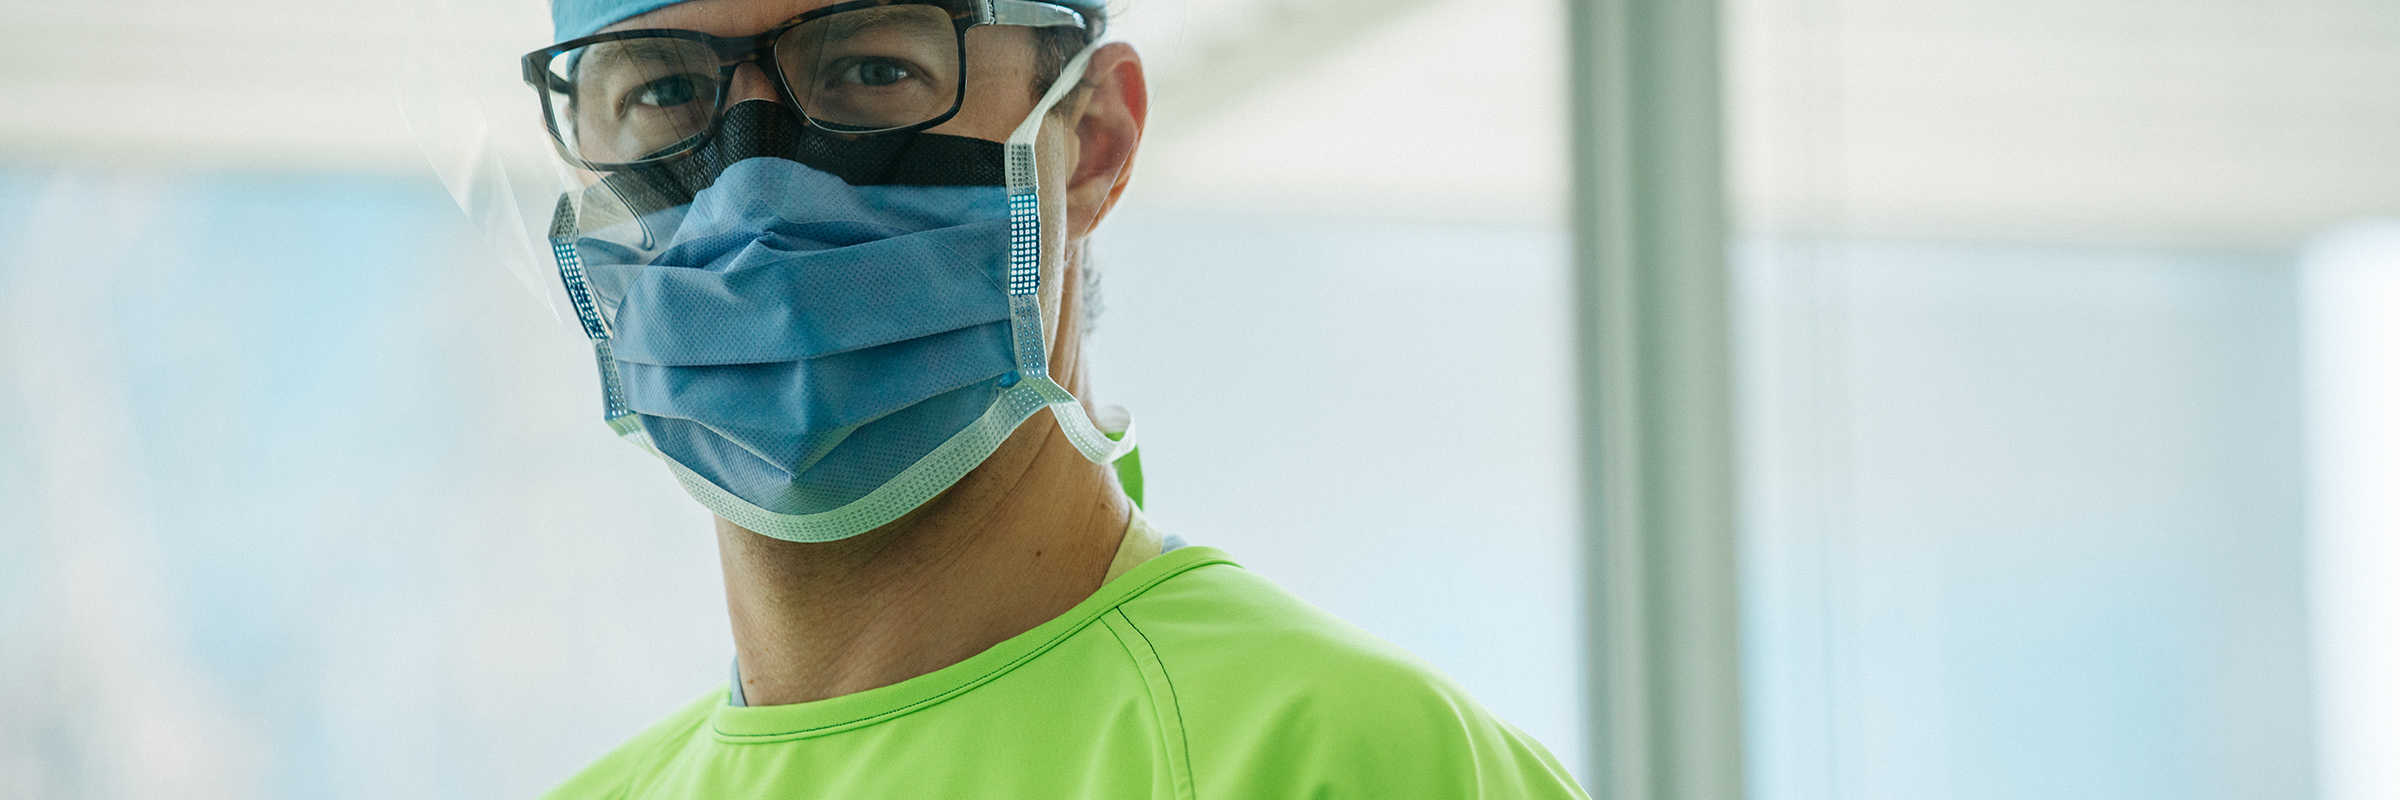 Arc'teryx: Du plein air aux vêtements médicaux